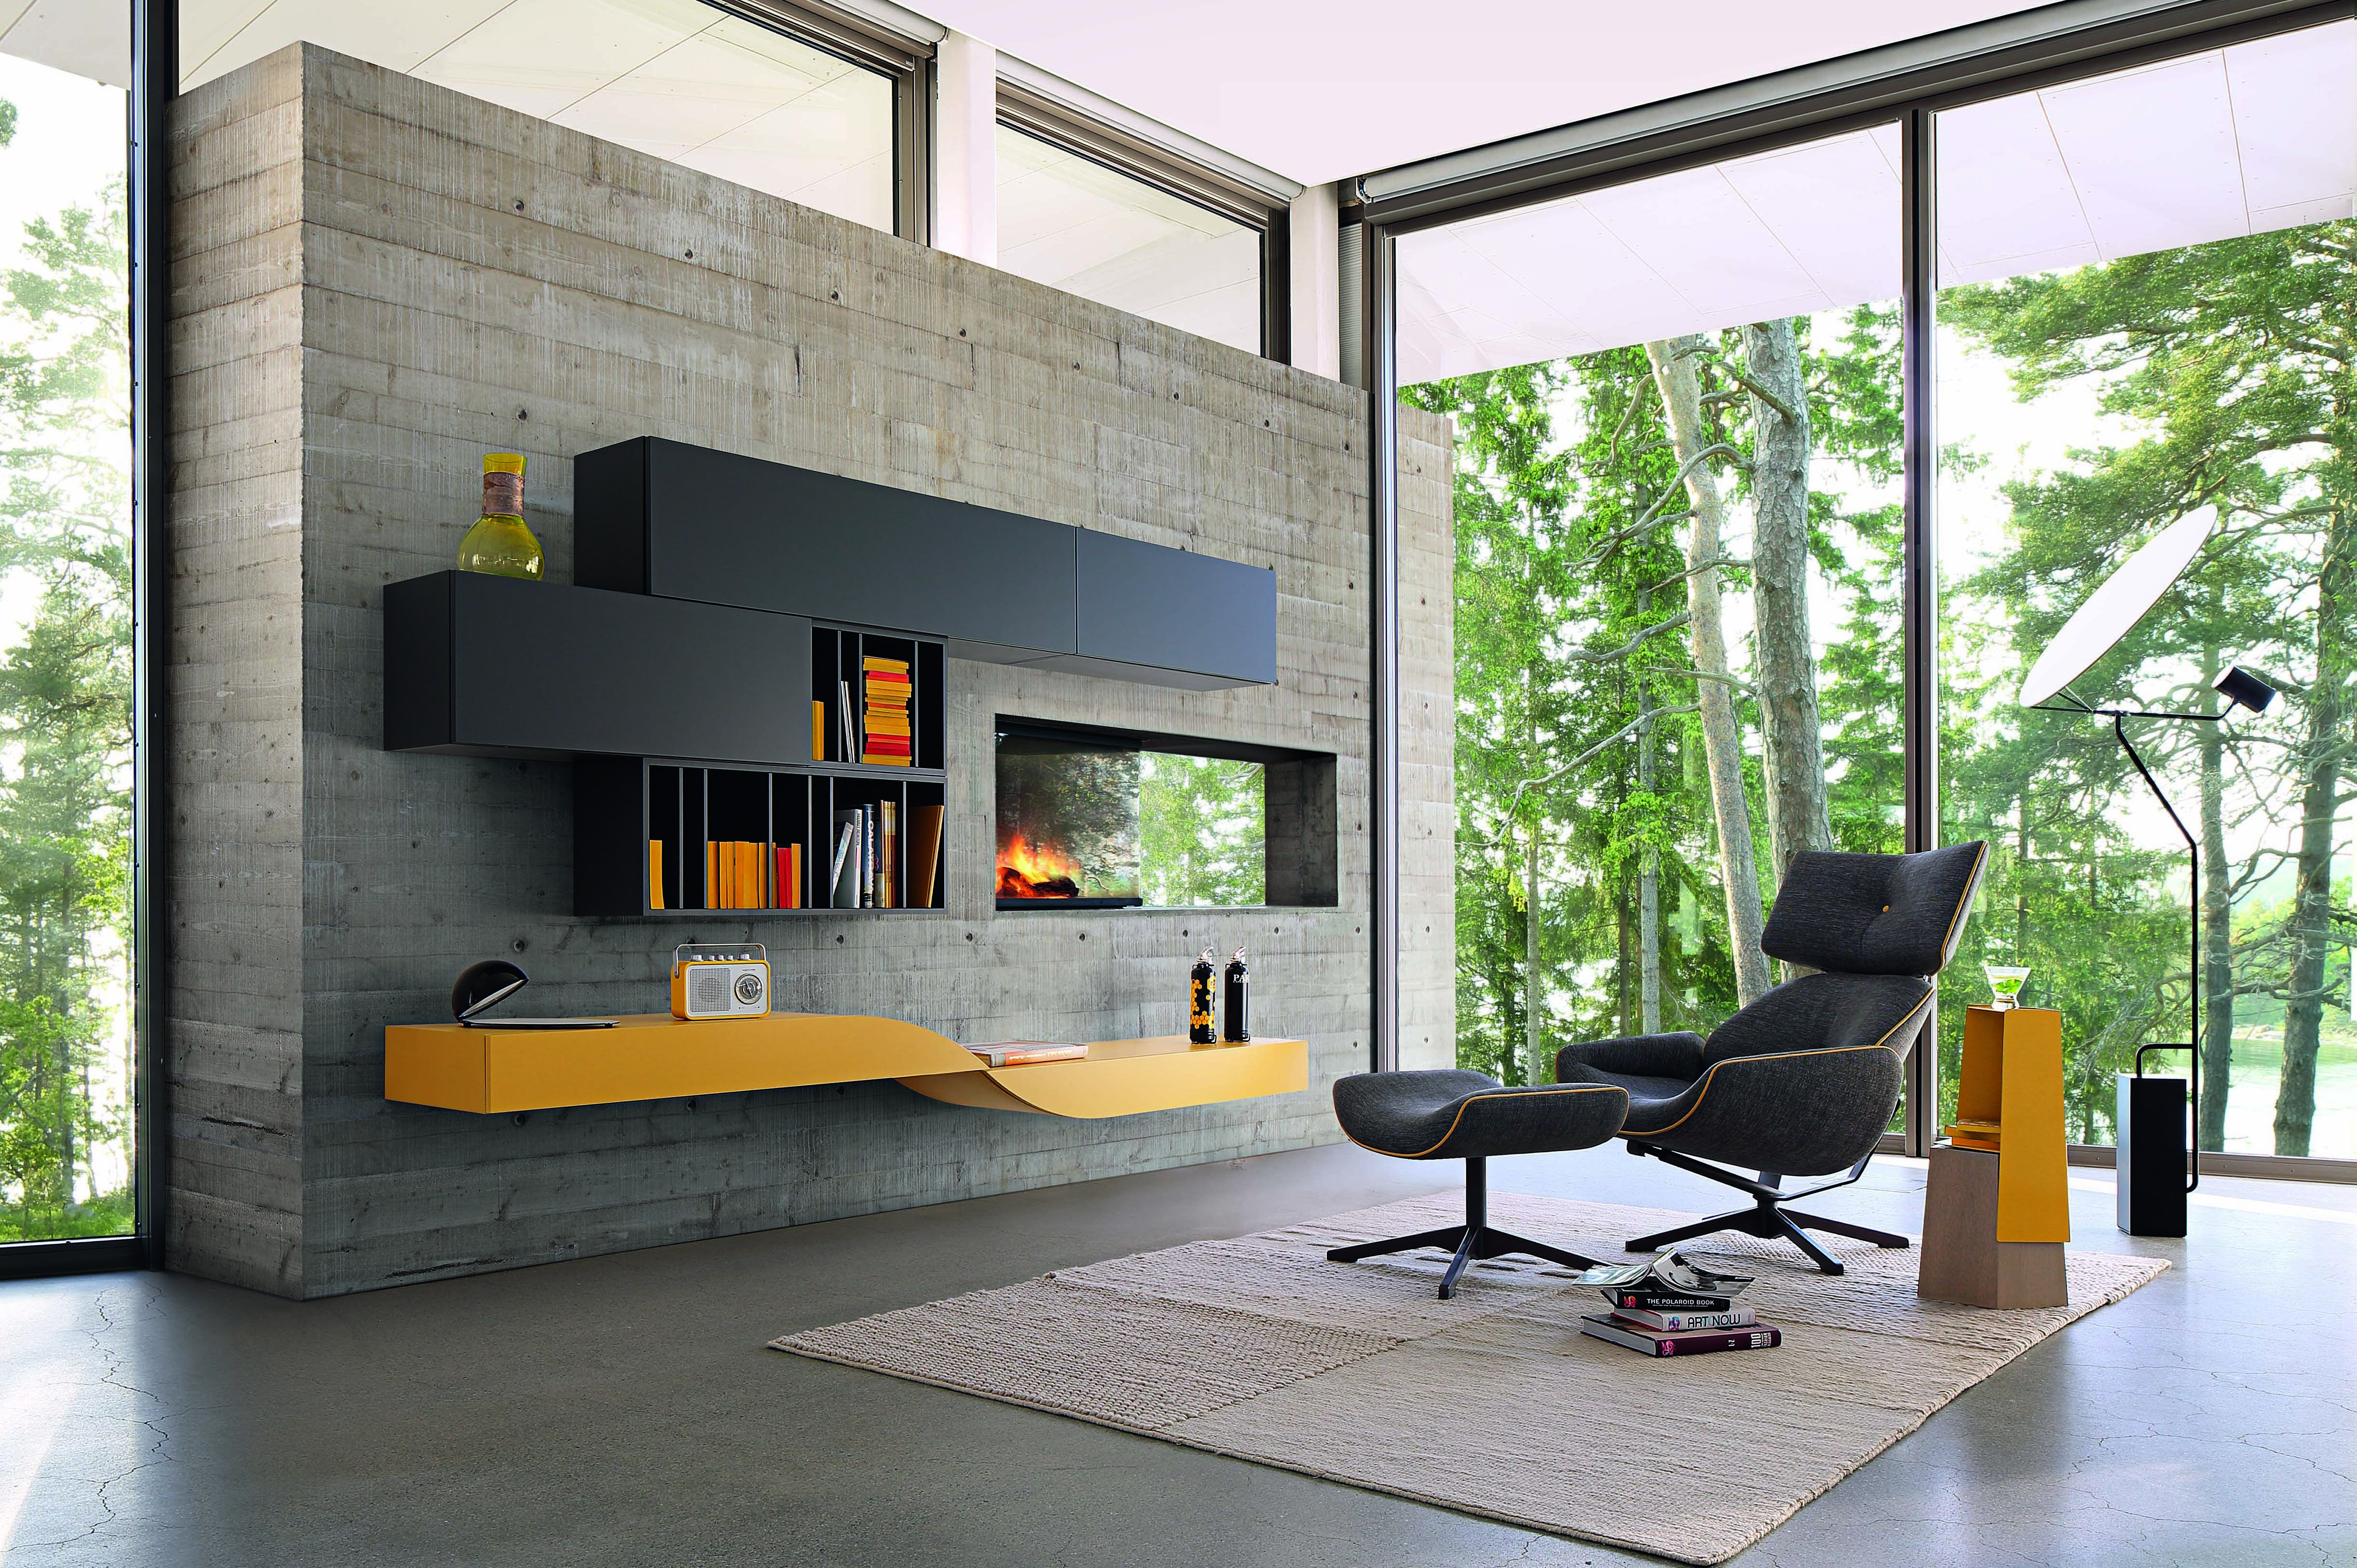 Roche Bobois Intralatina Wall Unit Design Marelli Molteni Rochebobois Contemporary Design Small Space Living Room Modular Walls Living Room Wall Units